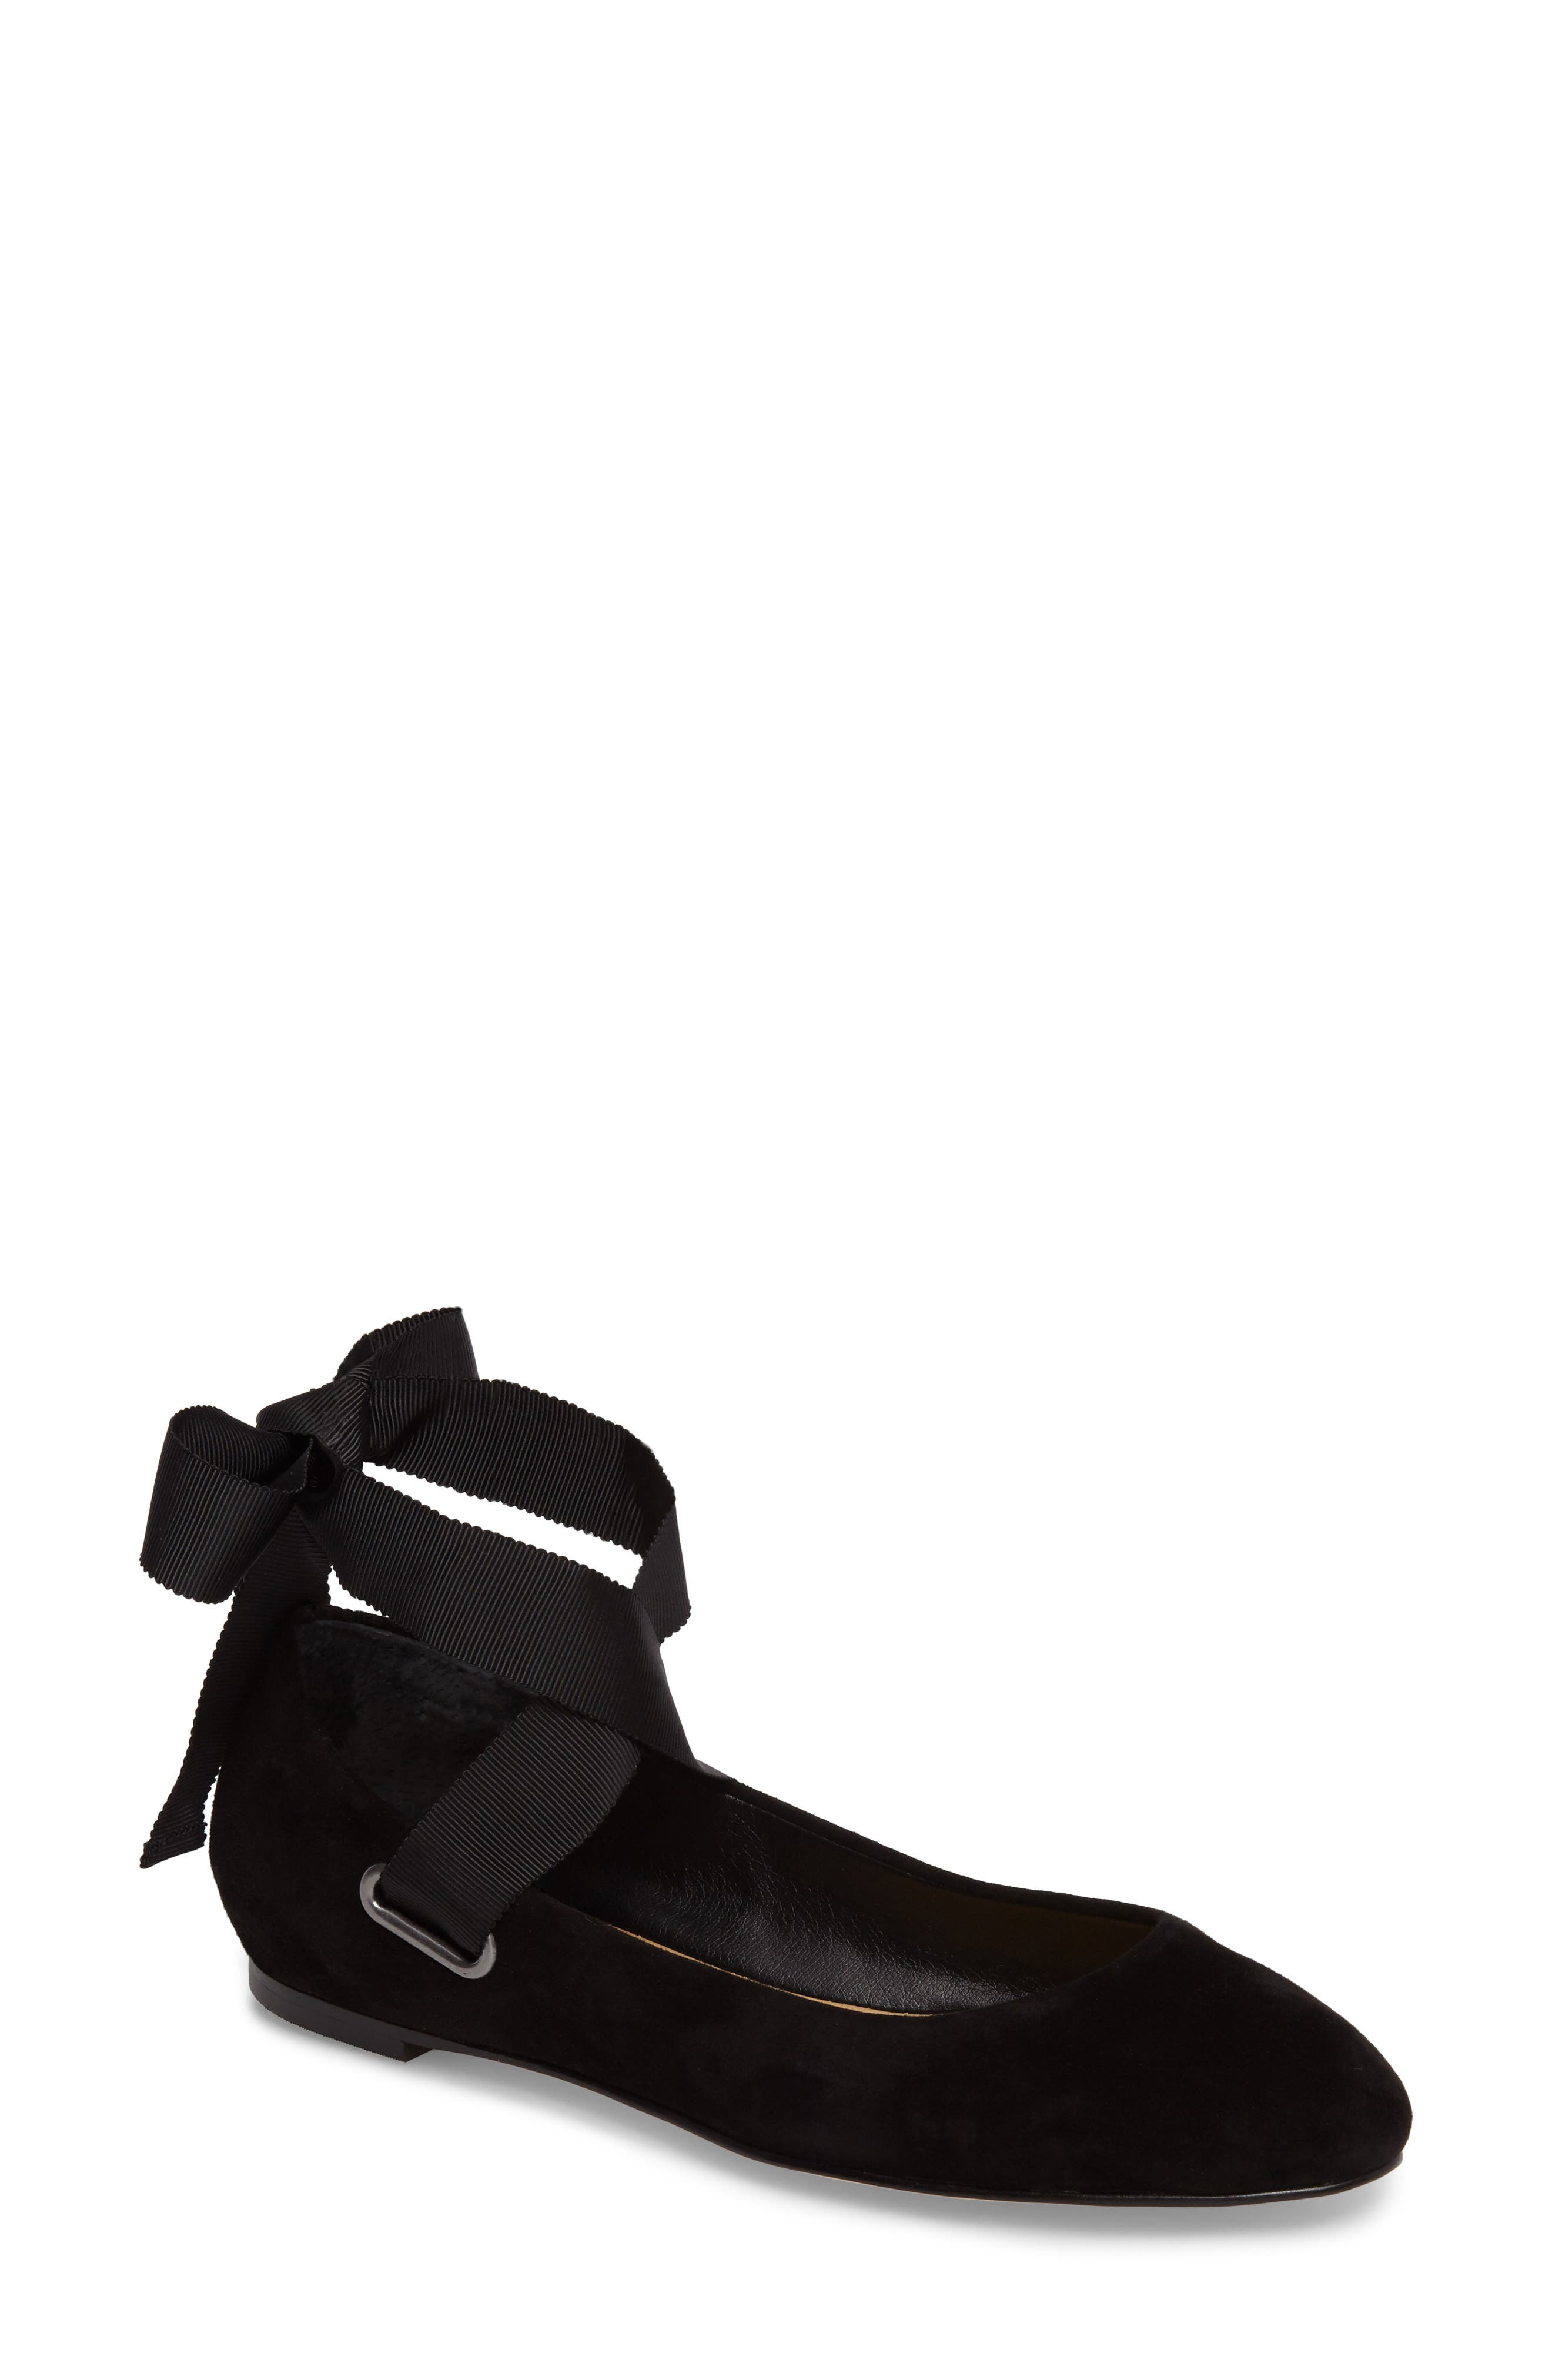 Renee Ankle Tie Flat,                             Main thumbnail 1, color,                             Black Suede